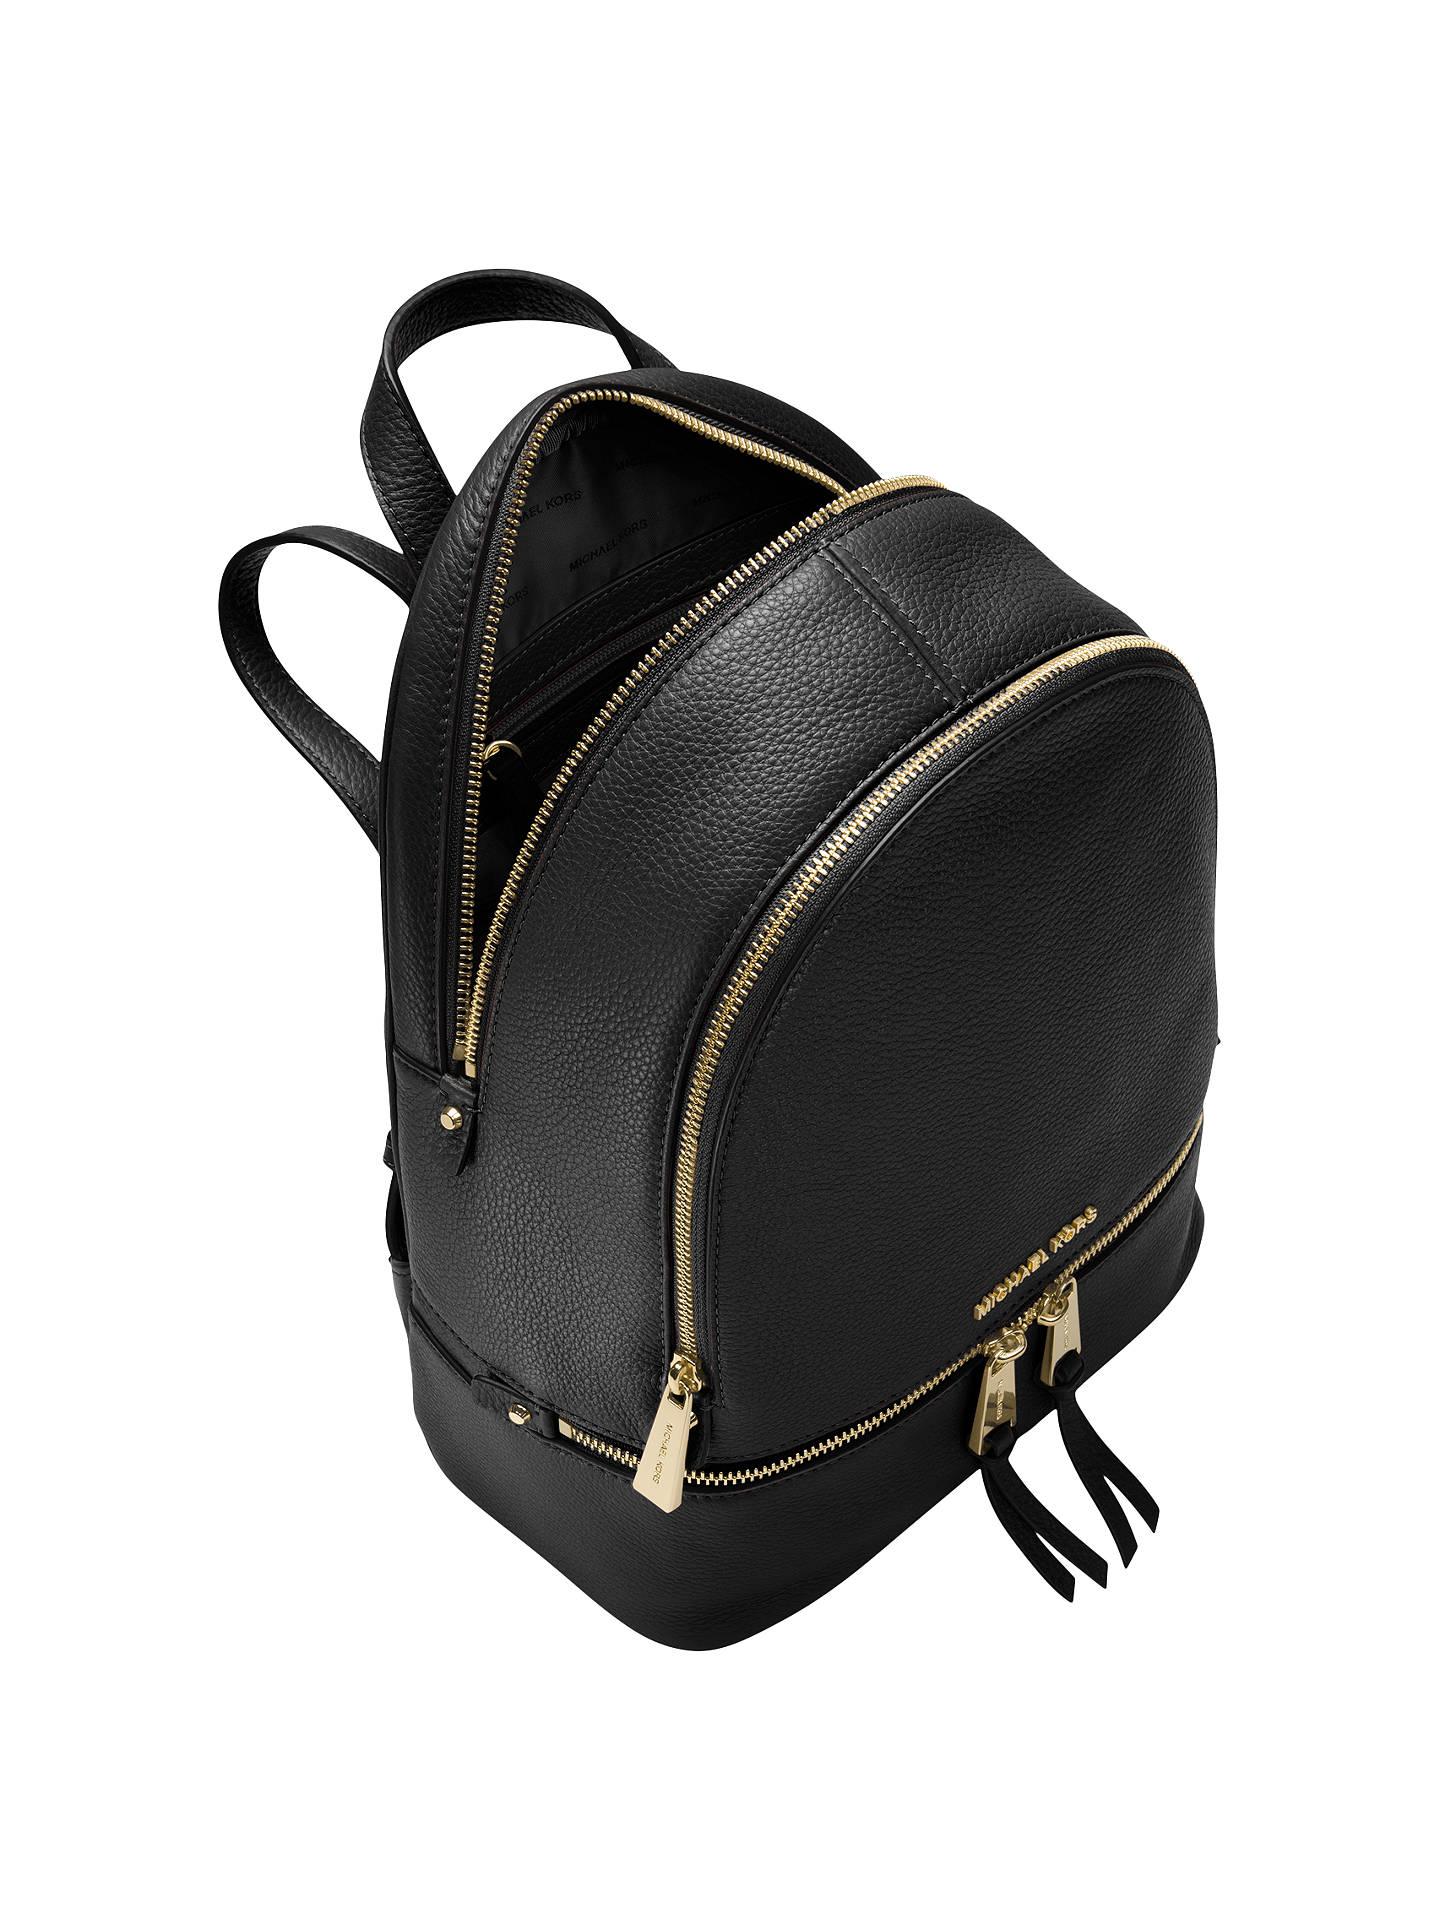 4079b8794f4b ... Buy MICHAEL Michael Kors Rhea Leather Backpack, Black Online at  johnlewis.com ...